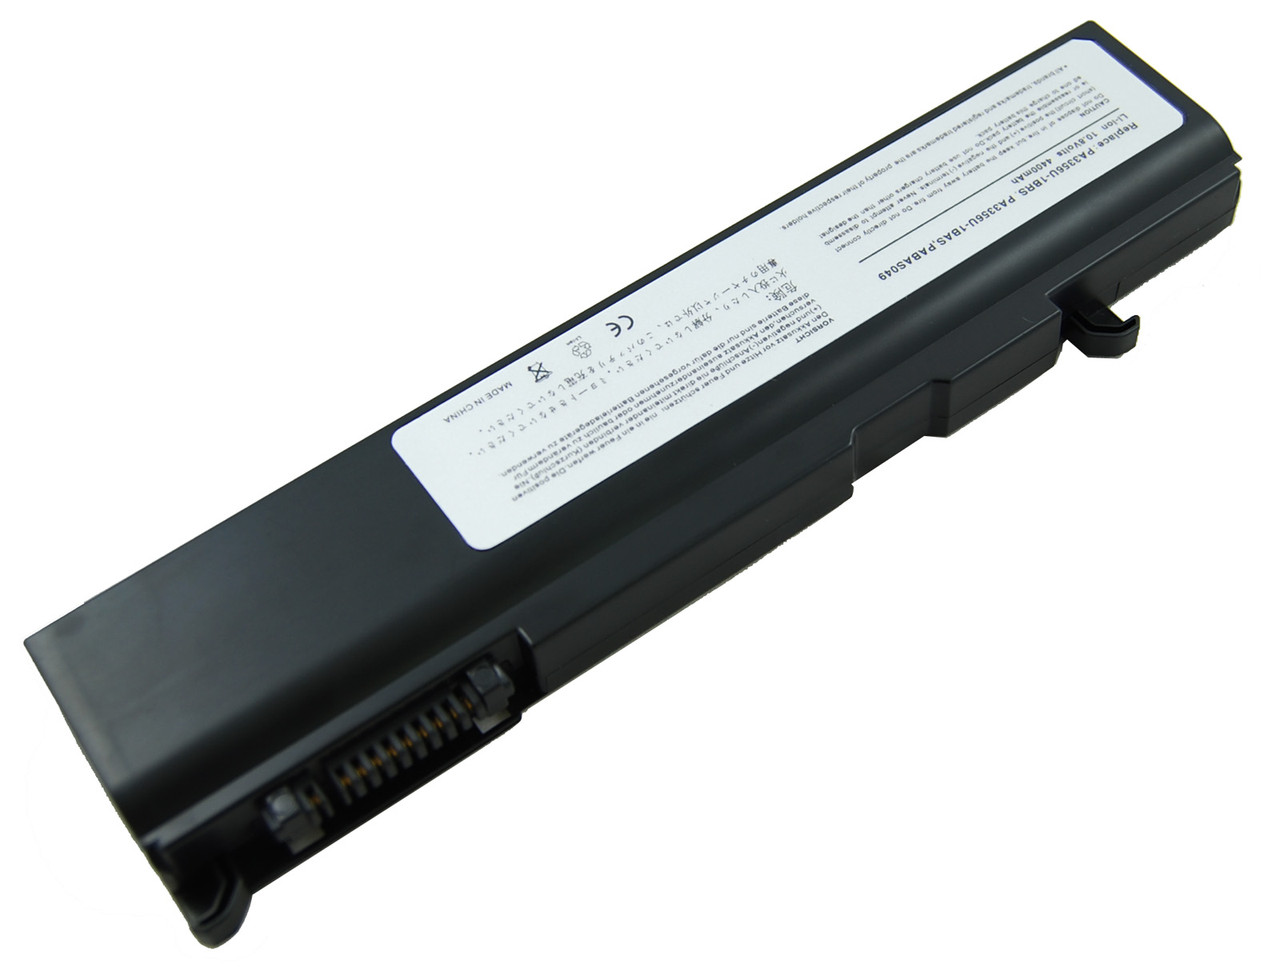 Аккумулятор для ноутбука Toshiba PA3356U-2BRS